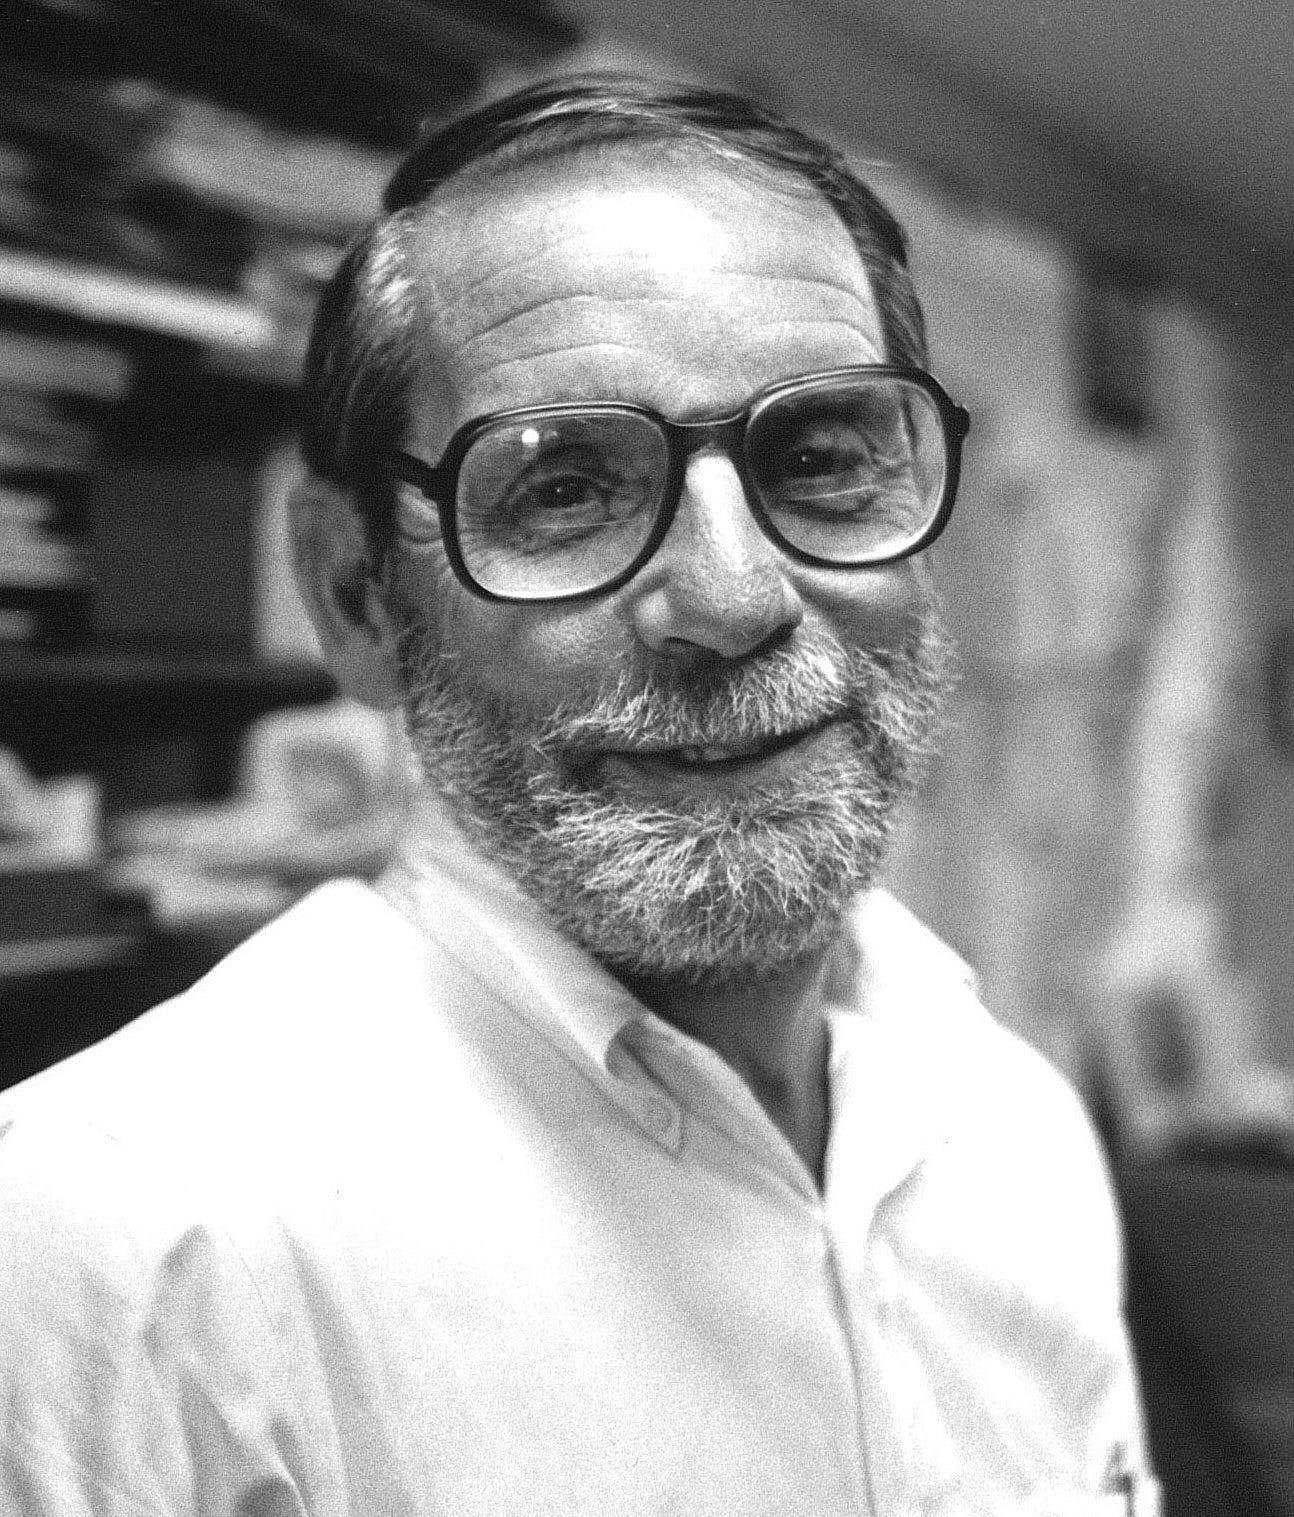 https://upload.wikimedia.org/wikipedia/commons/f/fb/John_Mcphee.jpg